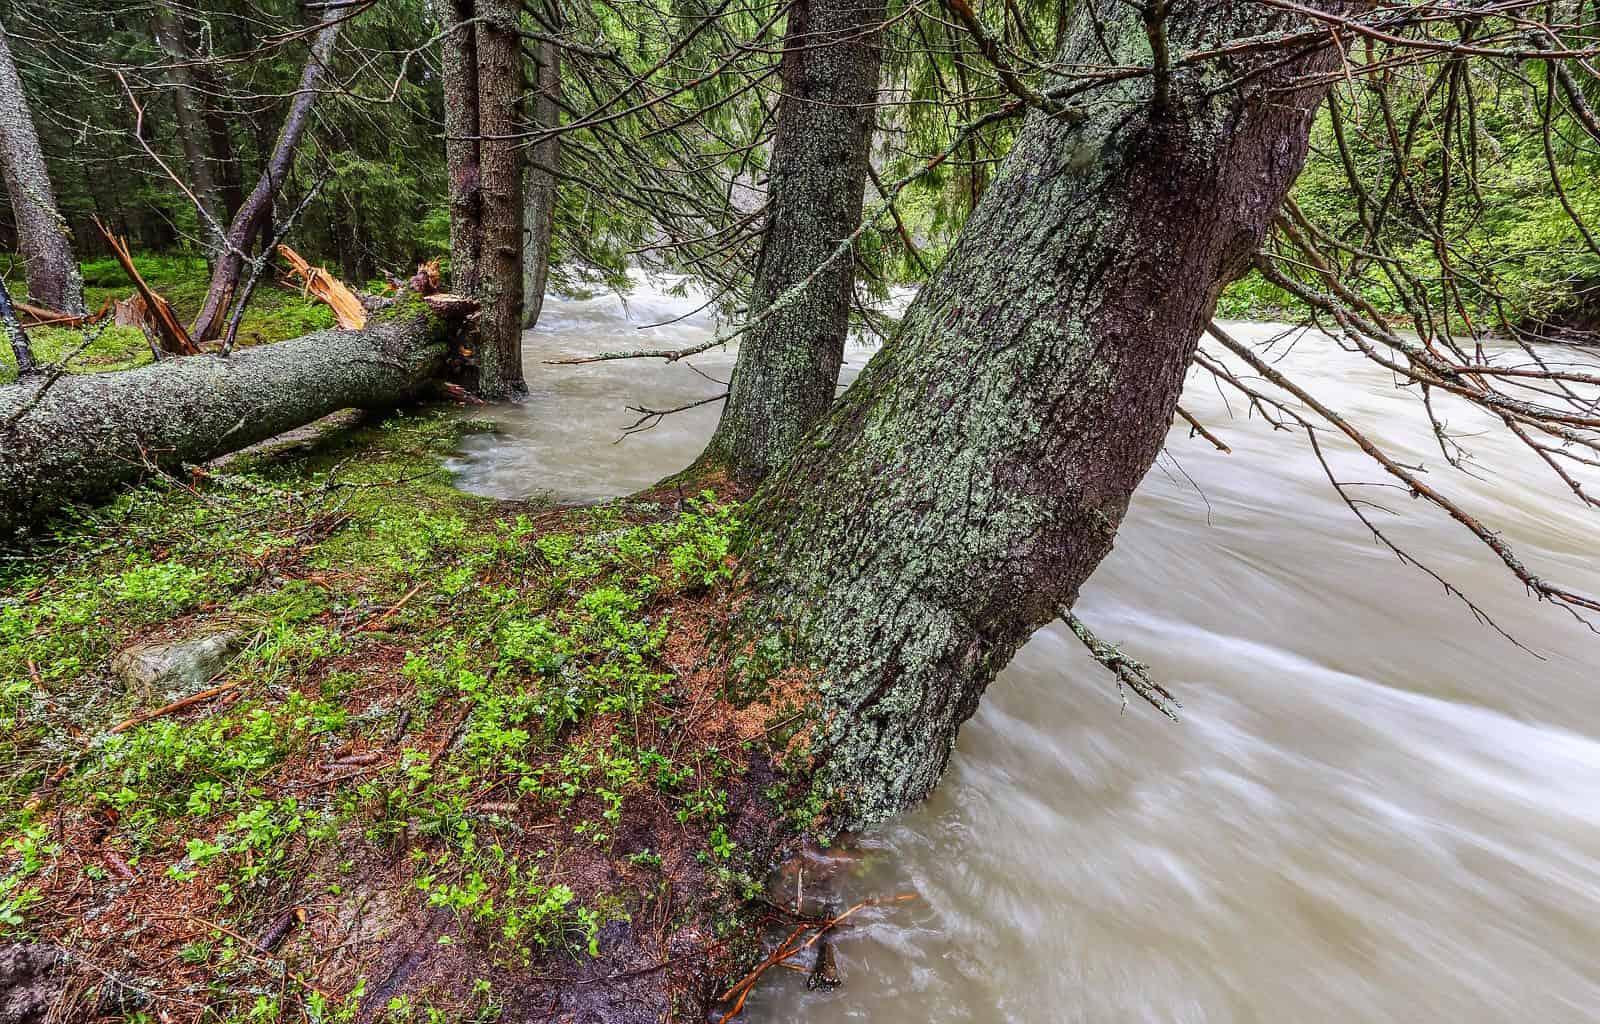 povode-na-belej_35152557585_o.jpg - European Wilderness Society  - CC NonCommercial-NoDerivates 4.0 International